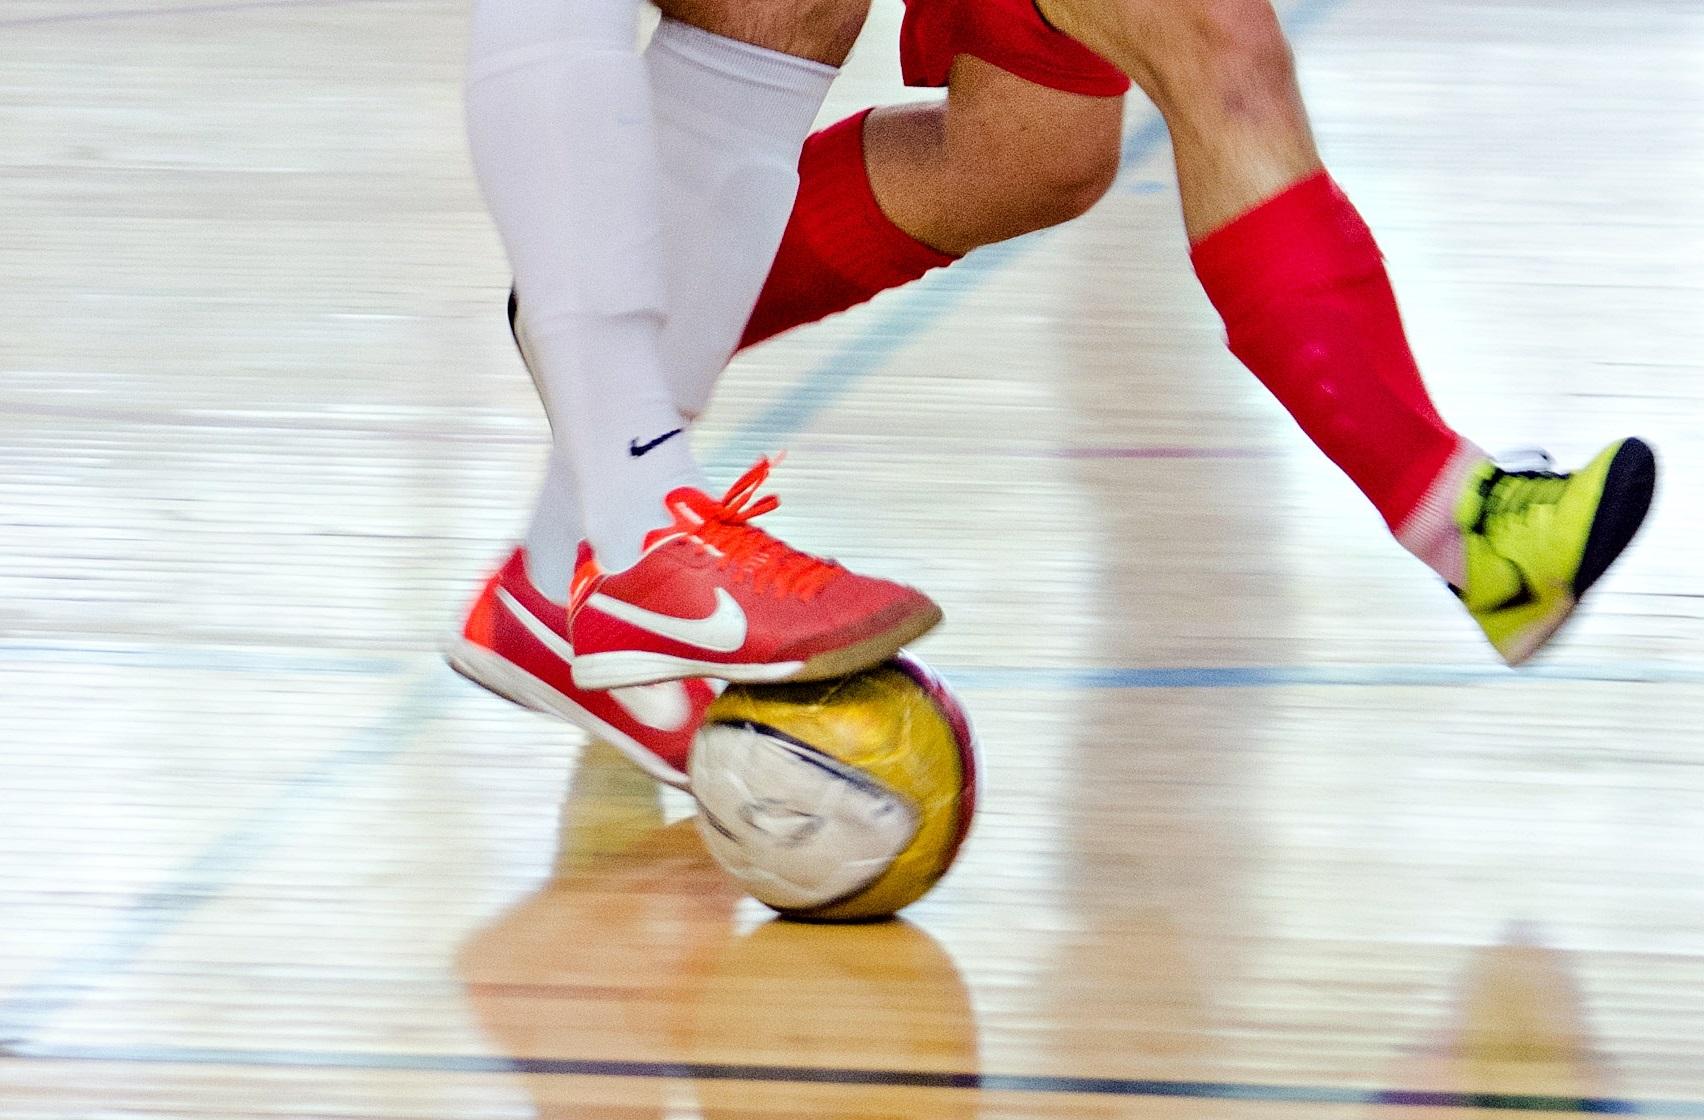 best-futsal-shoes-indoor-soccer-lightweight-shoes